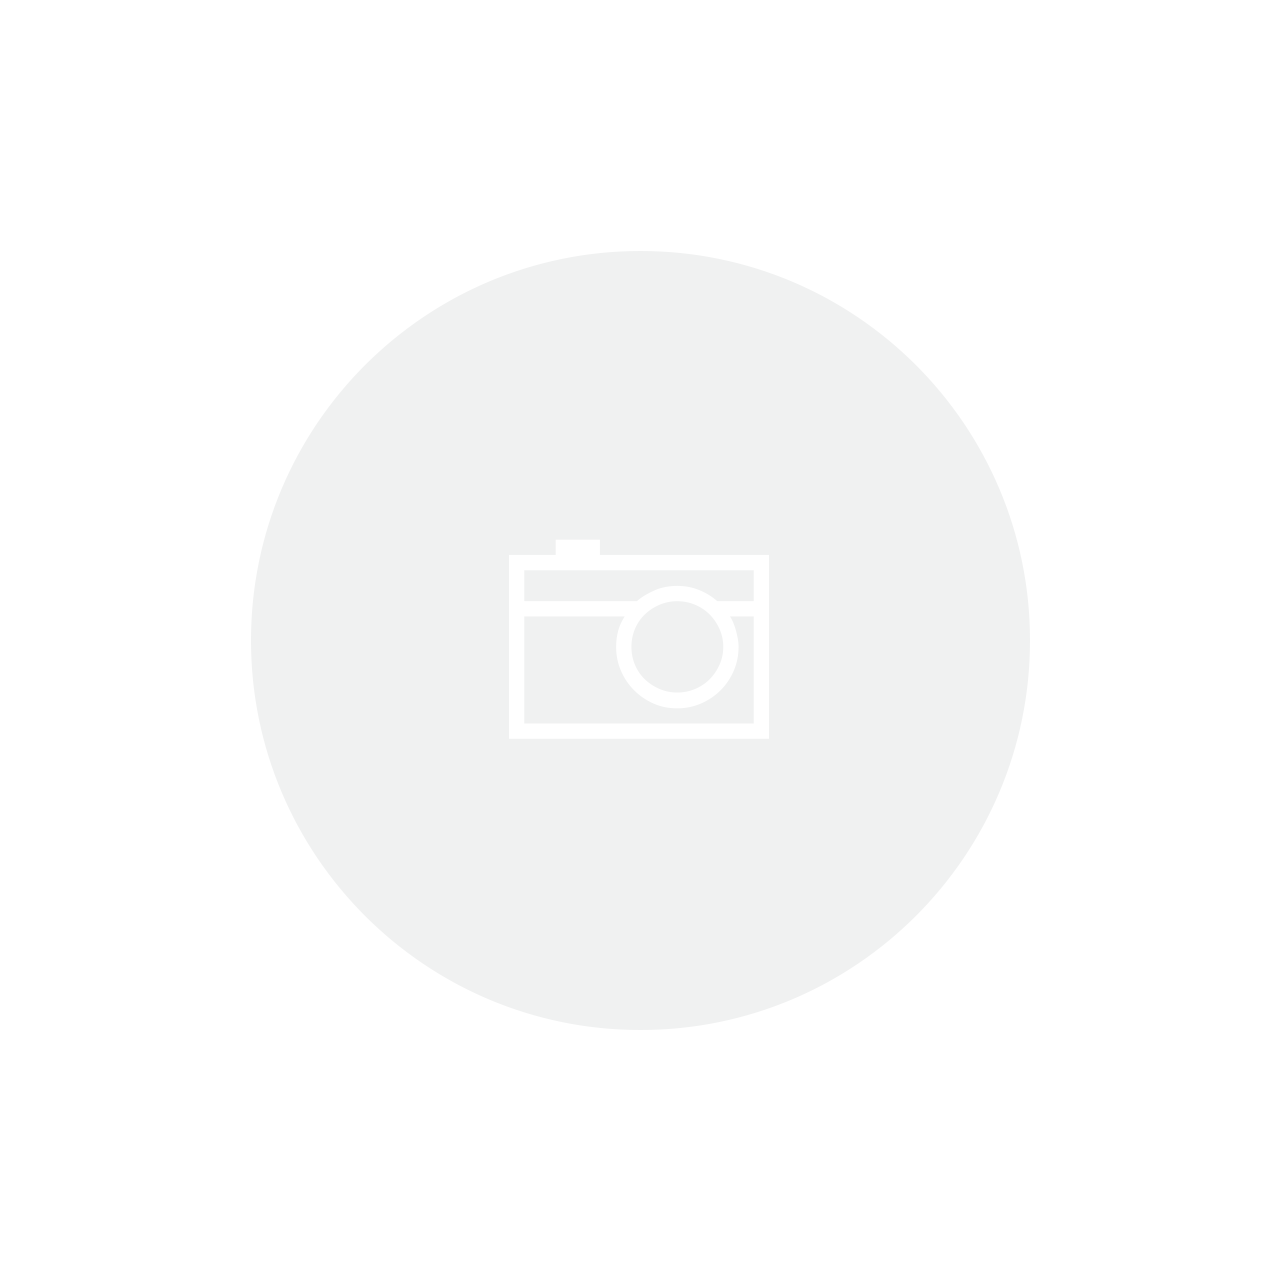 CARAMANHOLA CAMELBAK TERM. 750ML PODIUM BIG CHILL